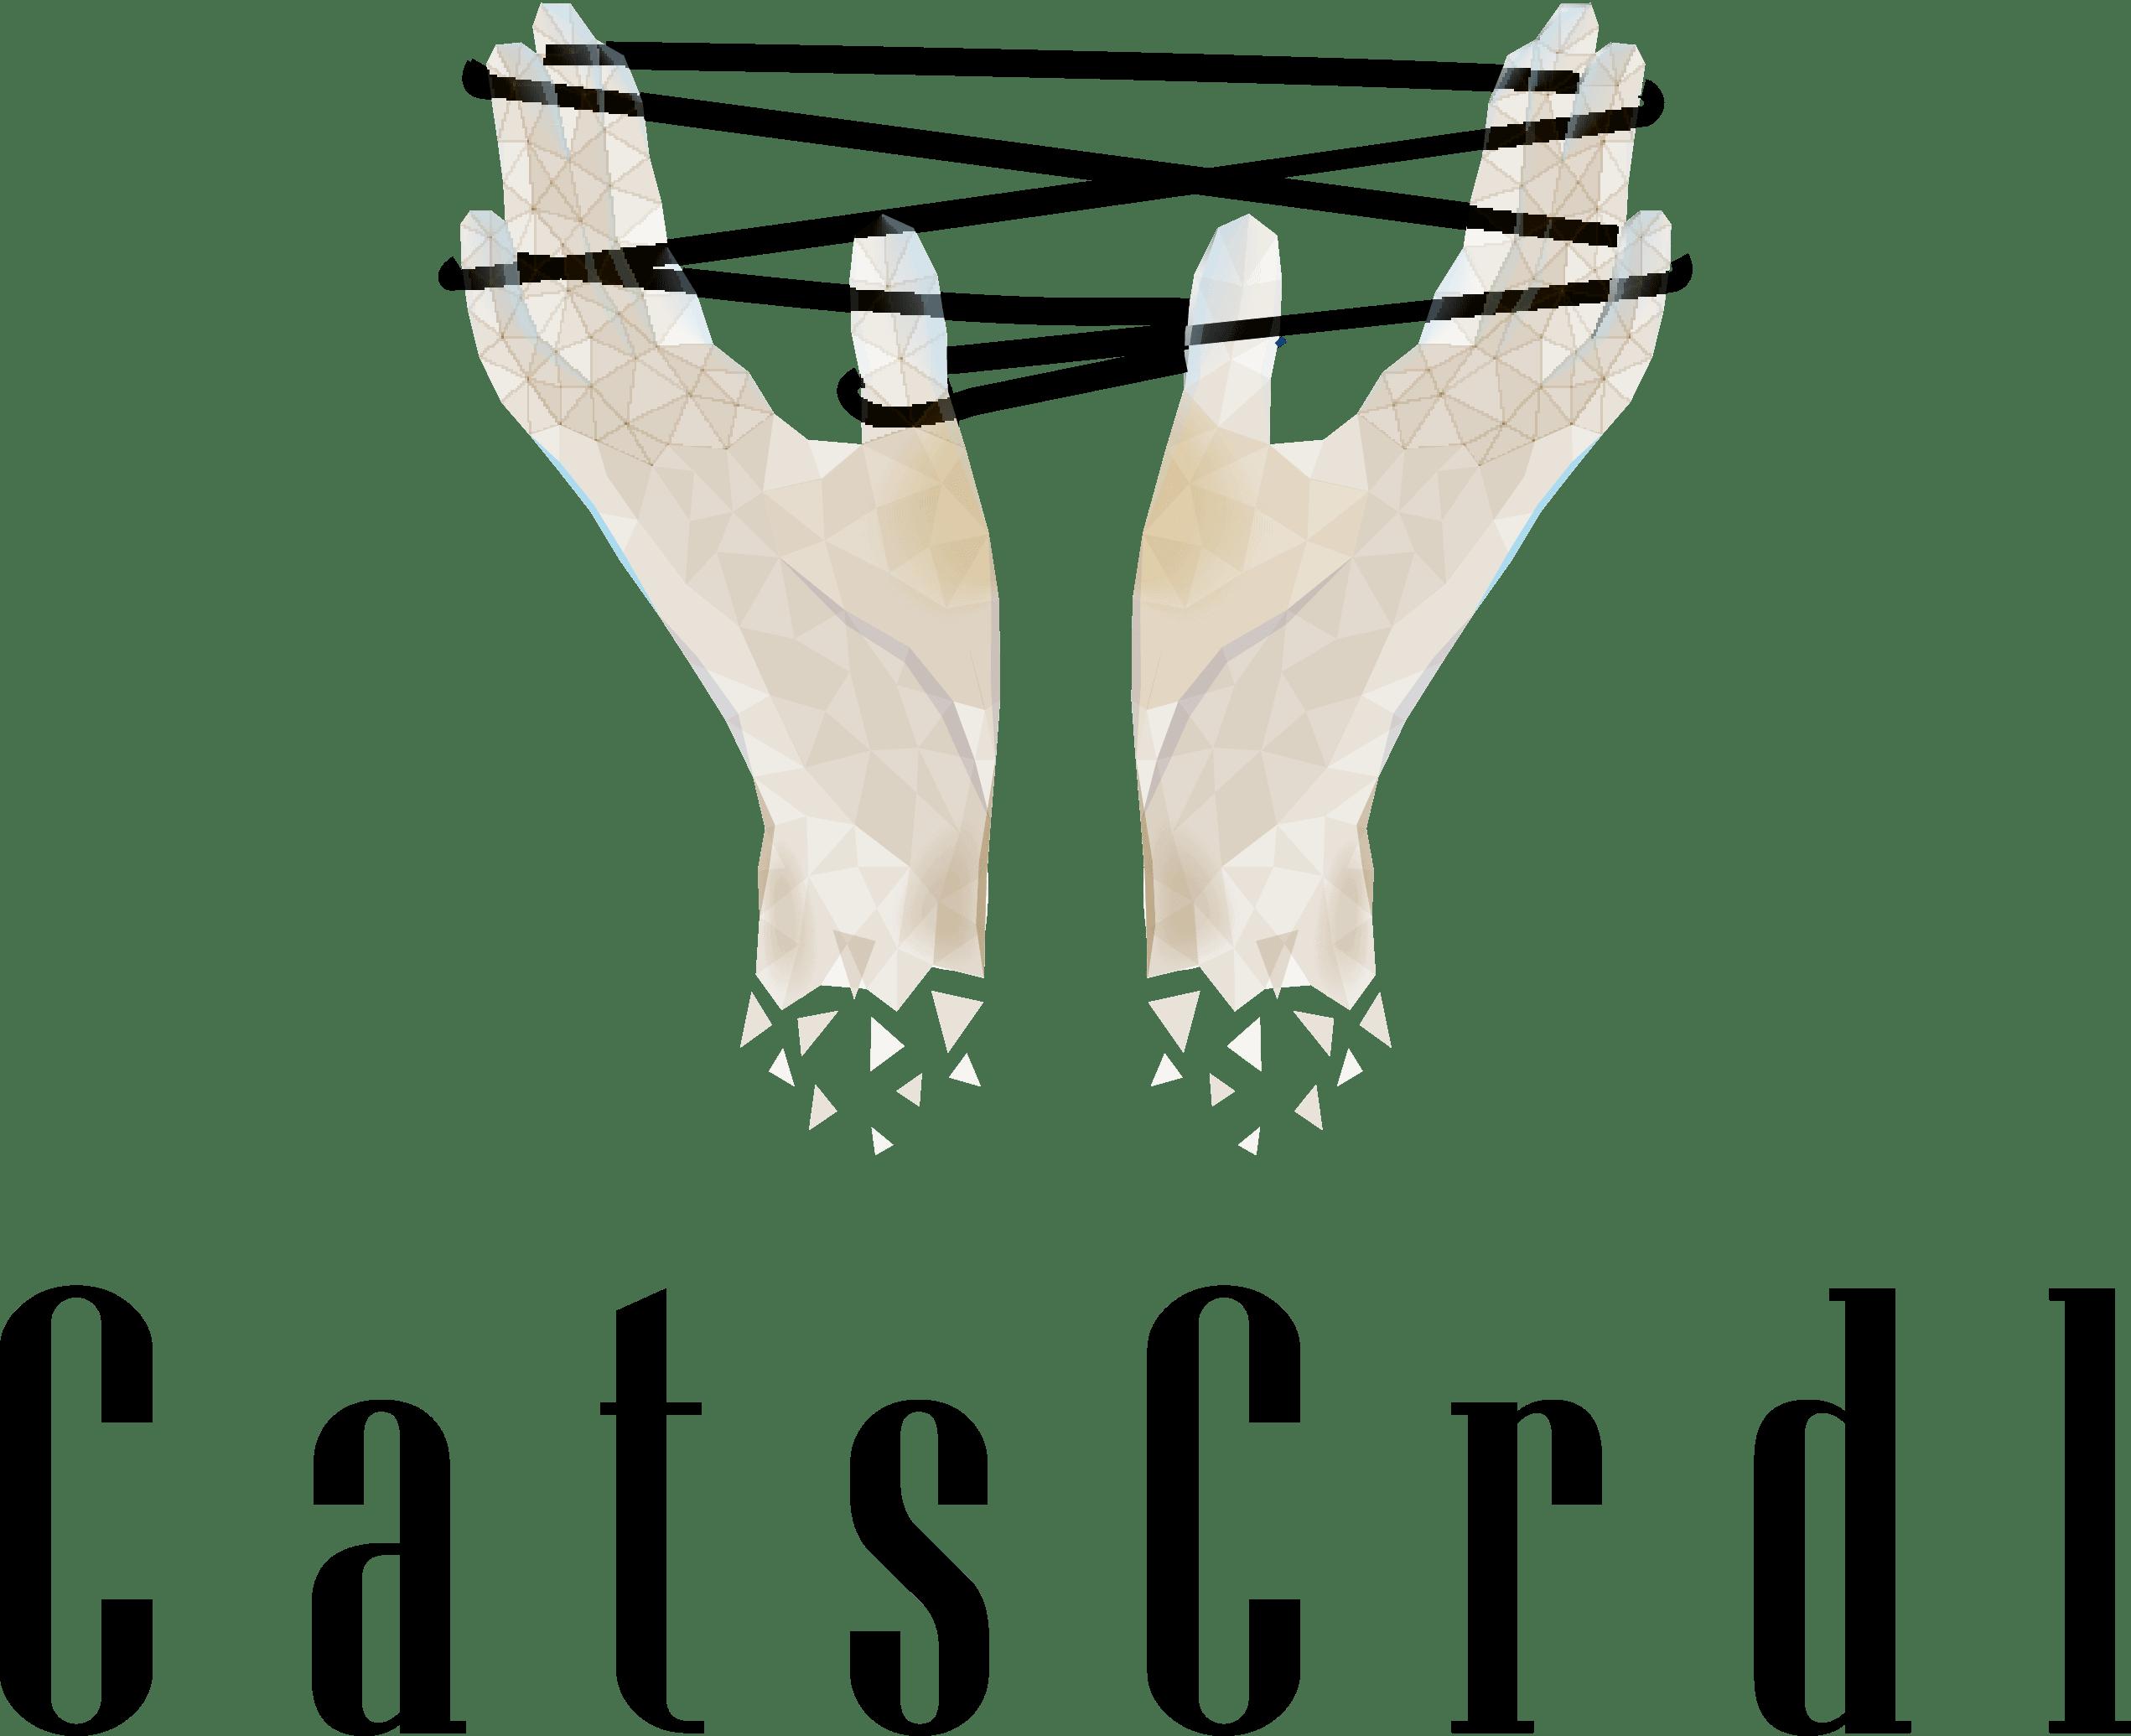 CatsCrdl